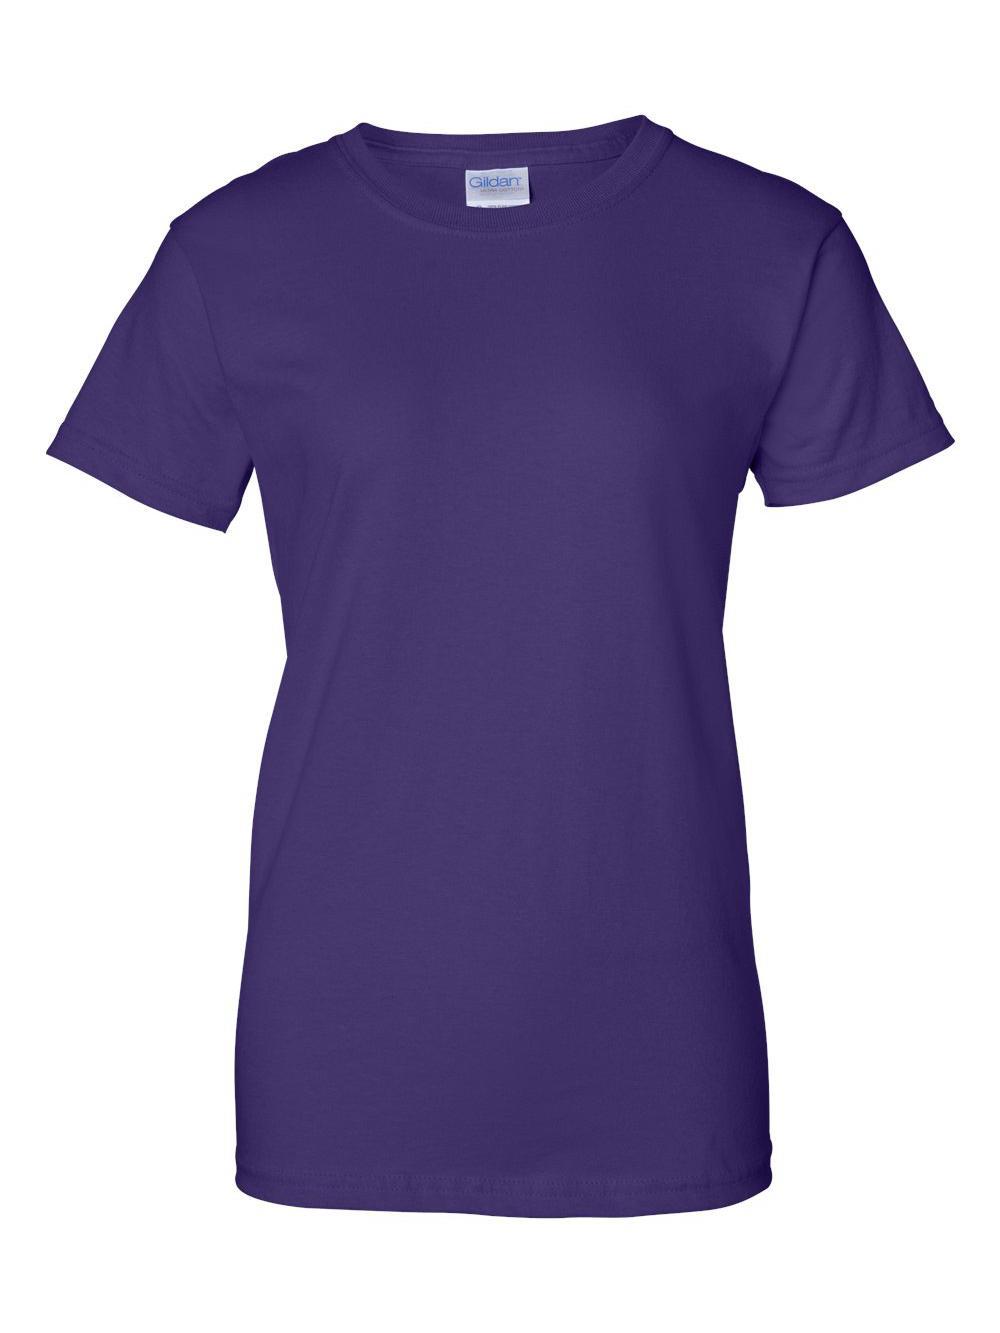 Gildan-Ultra-Cotton-Women-039-s-T-Shirt-2000L thumbnail 51